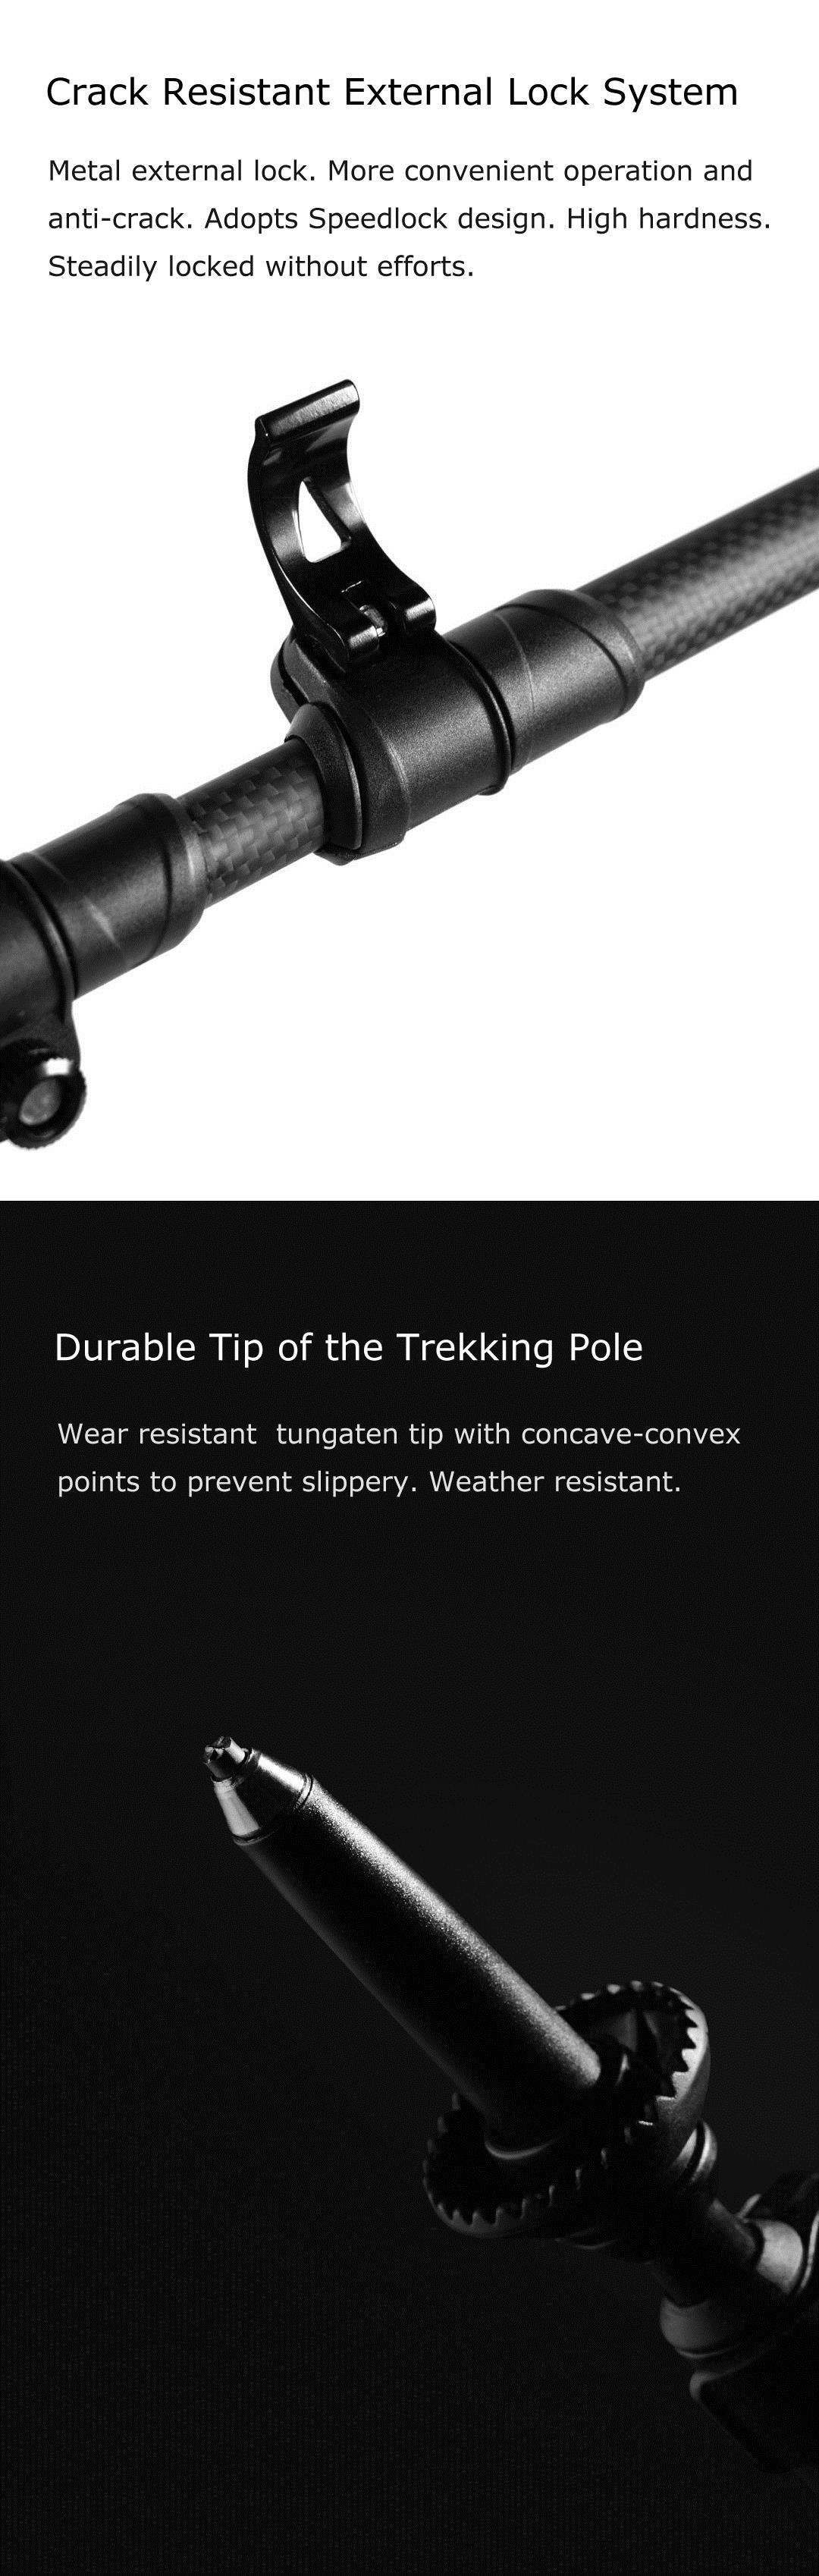 XIAOMI 3 Section Carbon Fiber Adjustable Canes Trekking Pole 222g Ultralight Anti-Slip Metal Lock Climbing Hiking Stick